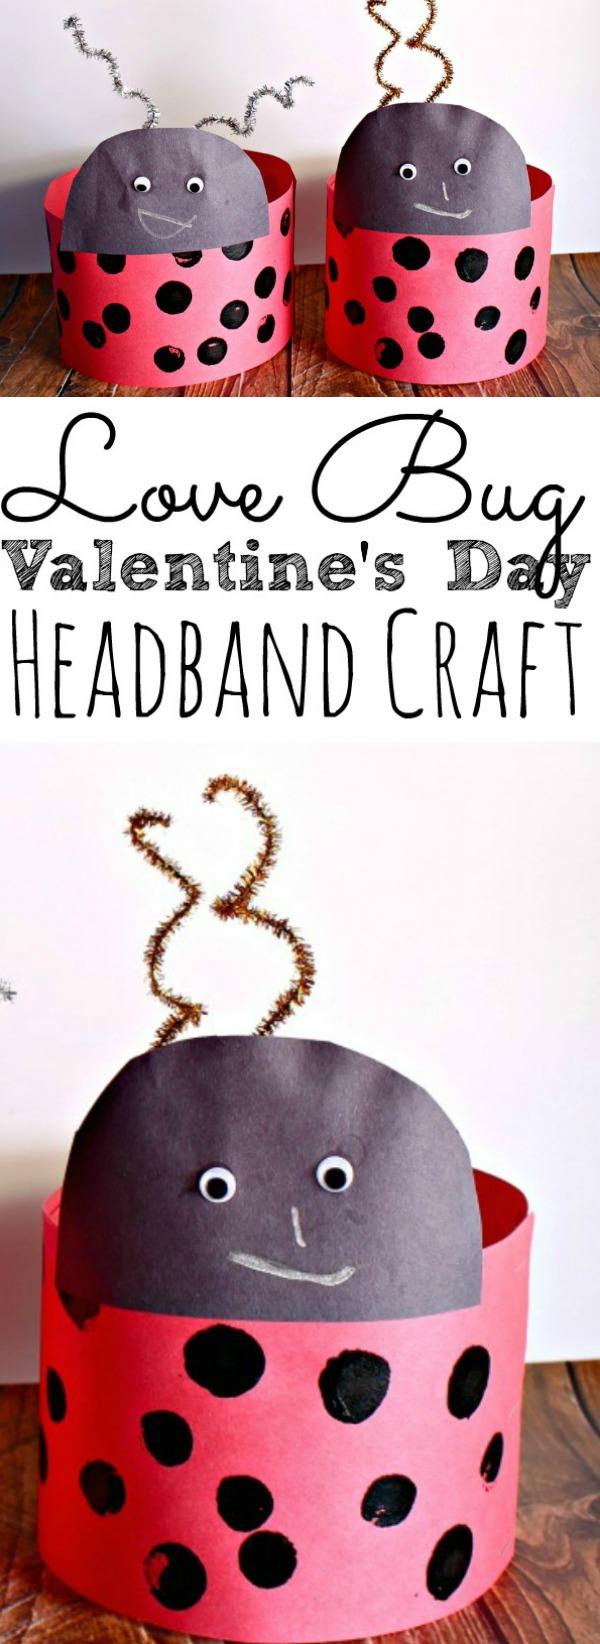 Valenitine's Day Lady Bug Headband Craft for Kids